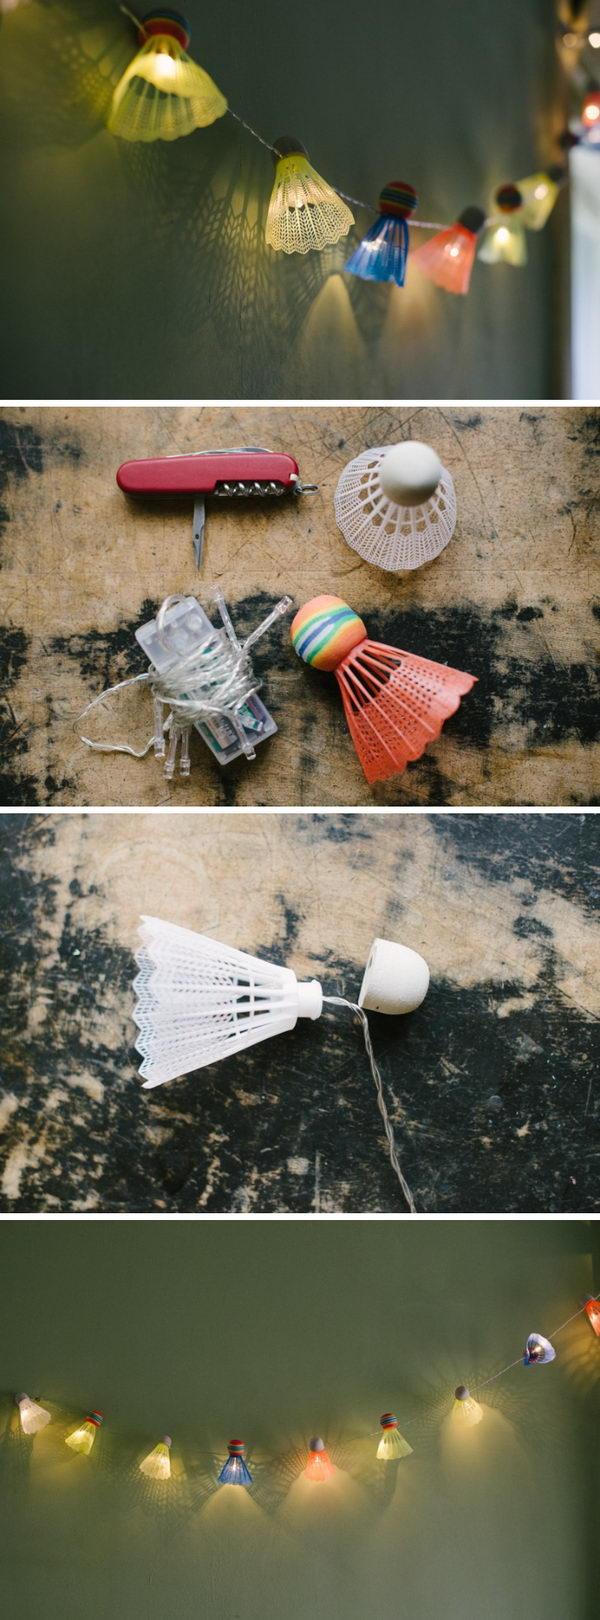 5 outdoor lighting diy ideas tutorials - 15 Easy DIY Outdoor Lighting Ideas